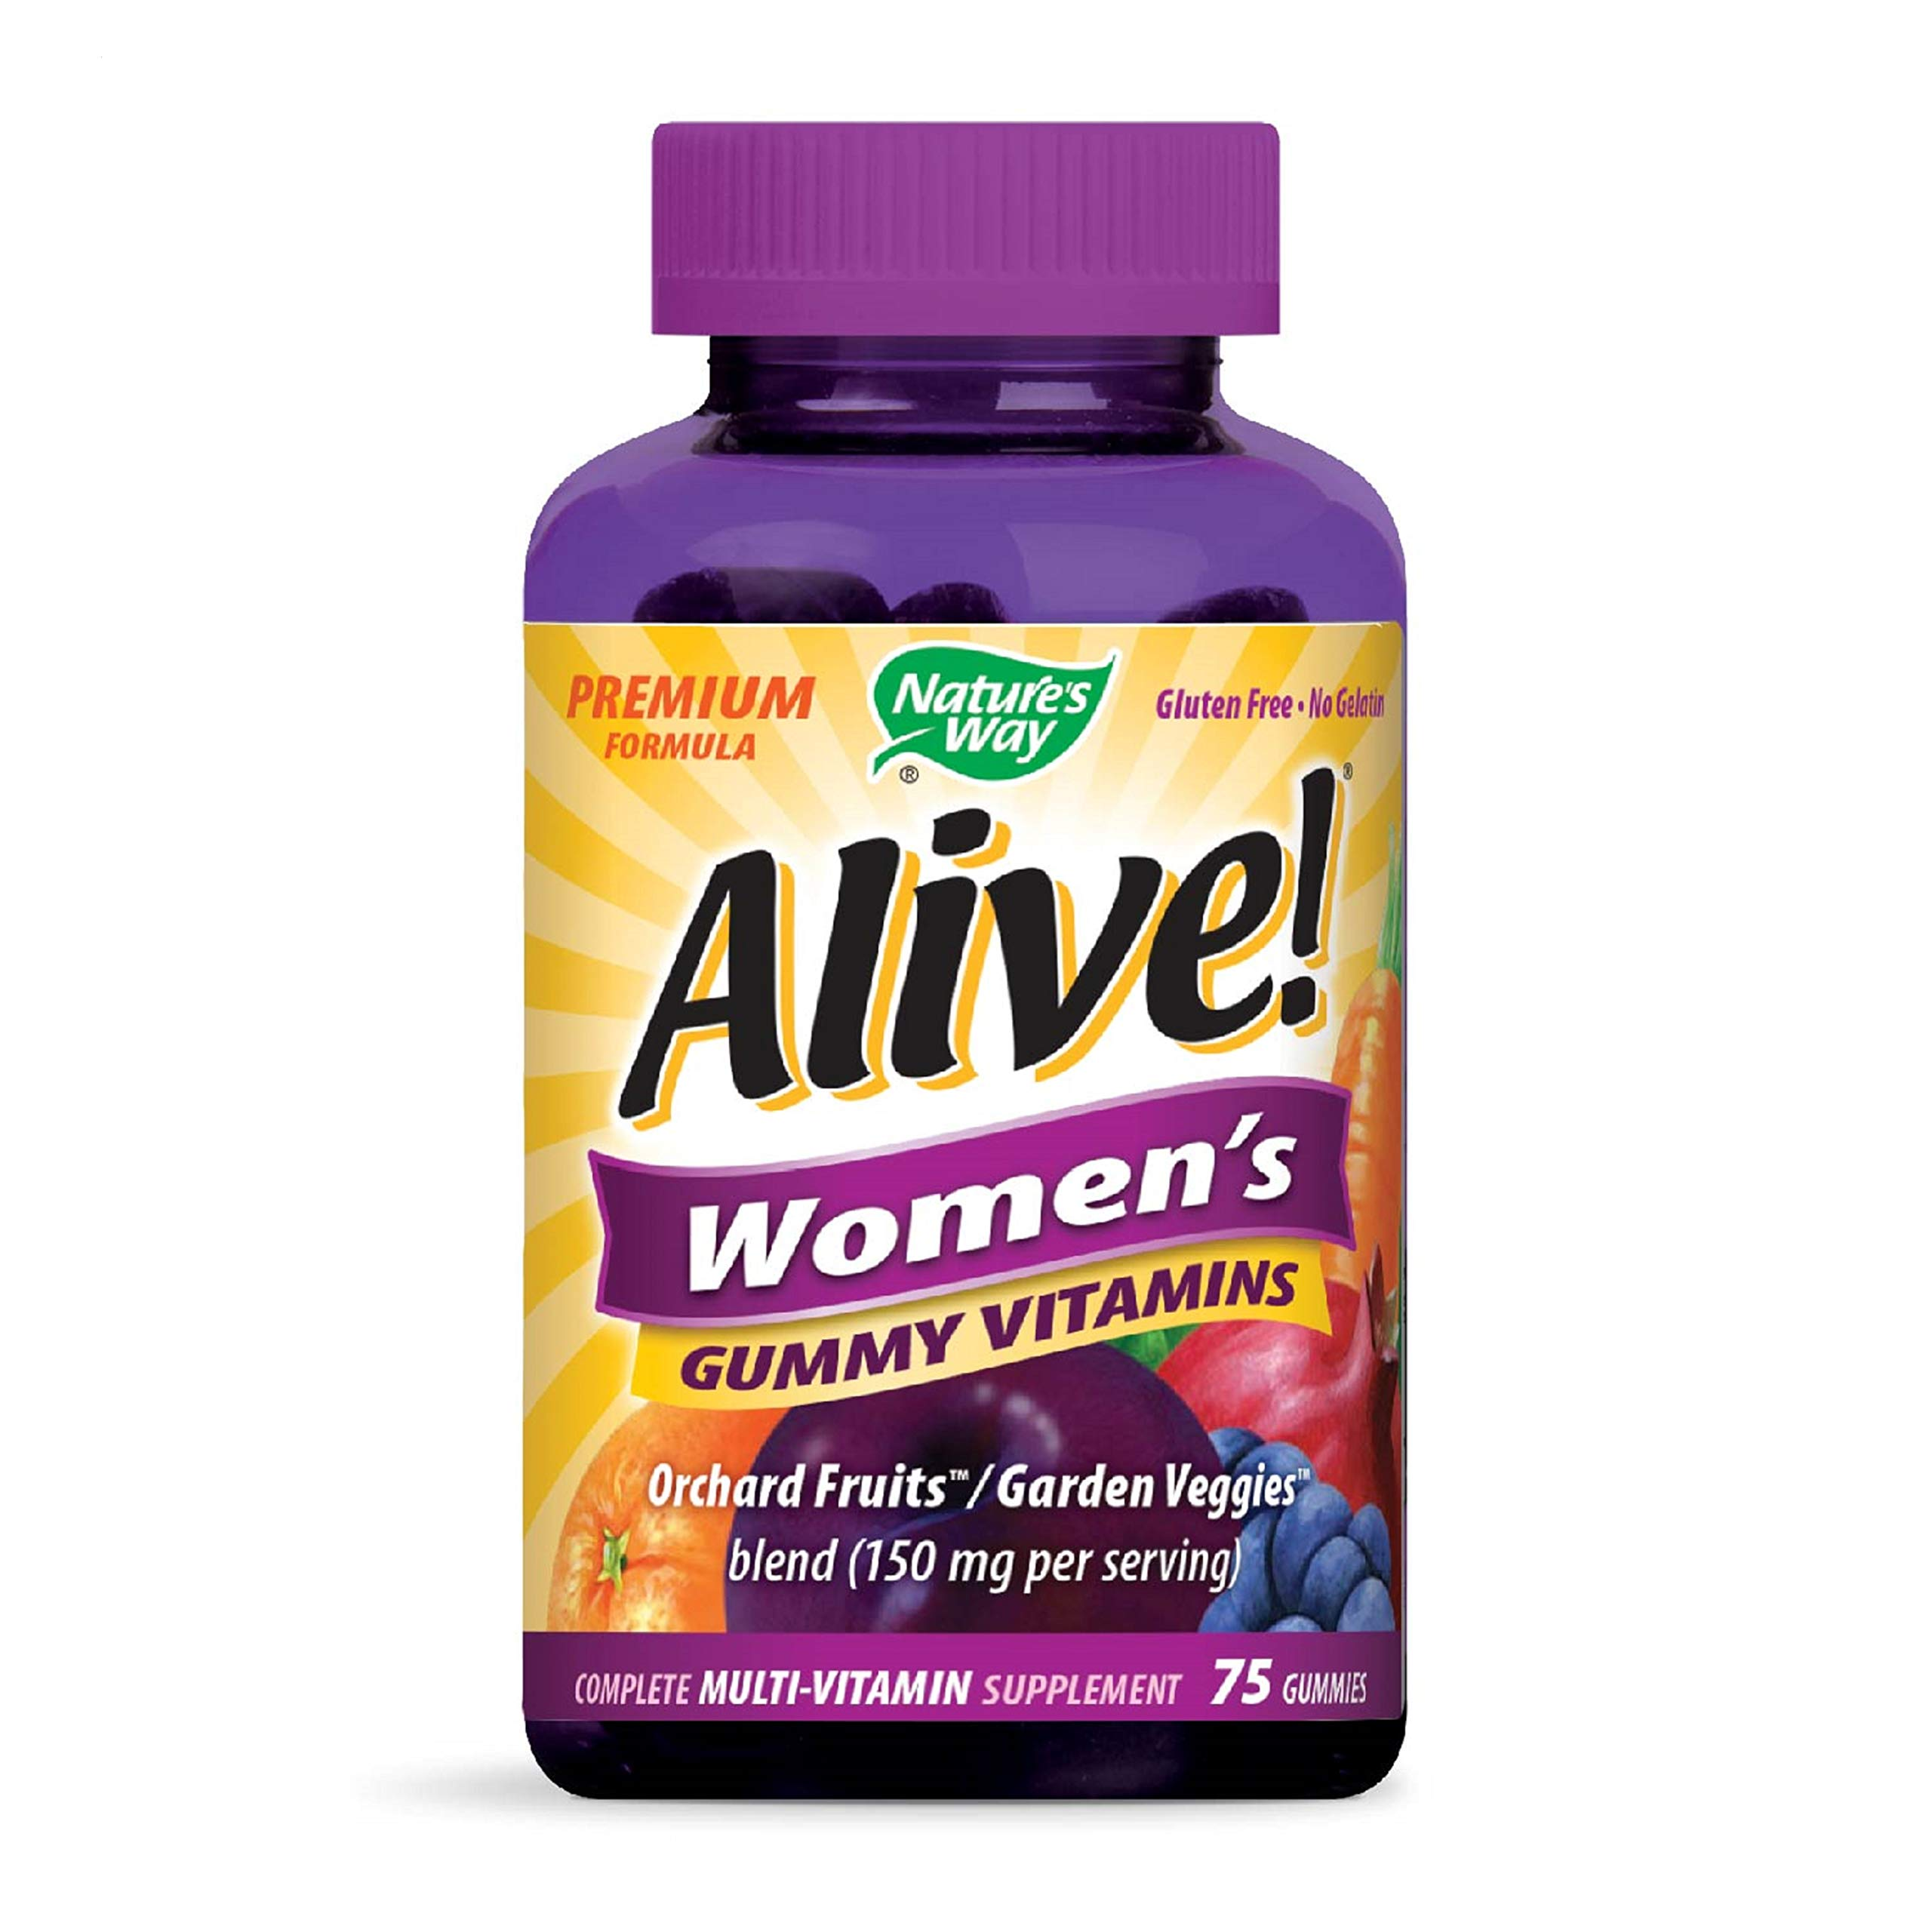 Nature's Way Alive! Women's Premium Gummy Multivitamin